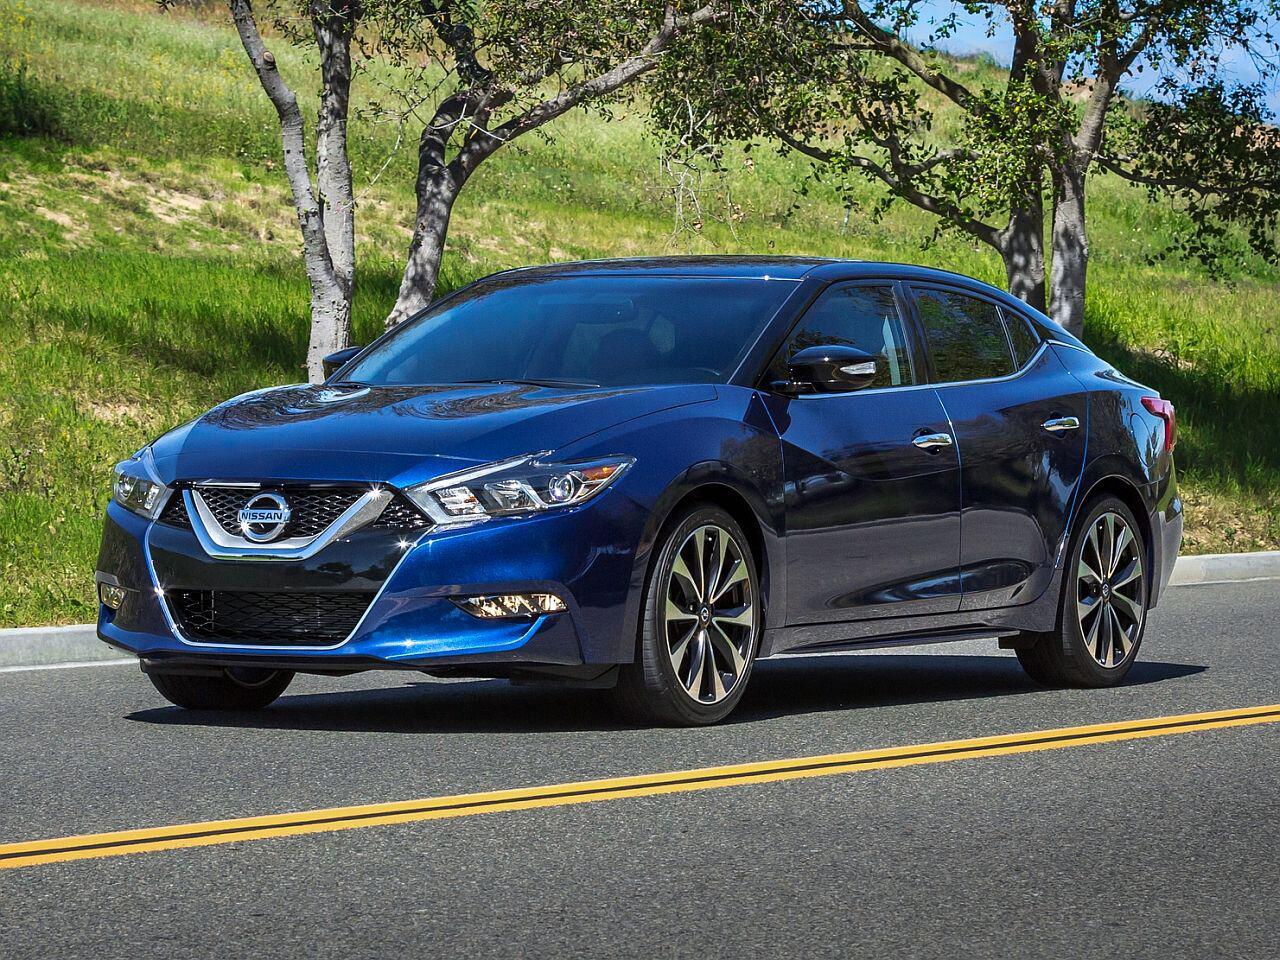 Bild zu Platz 8: Nissan Maxima